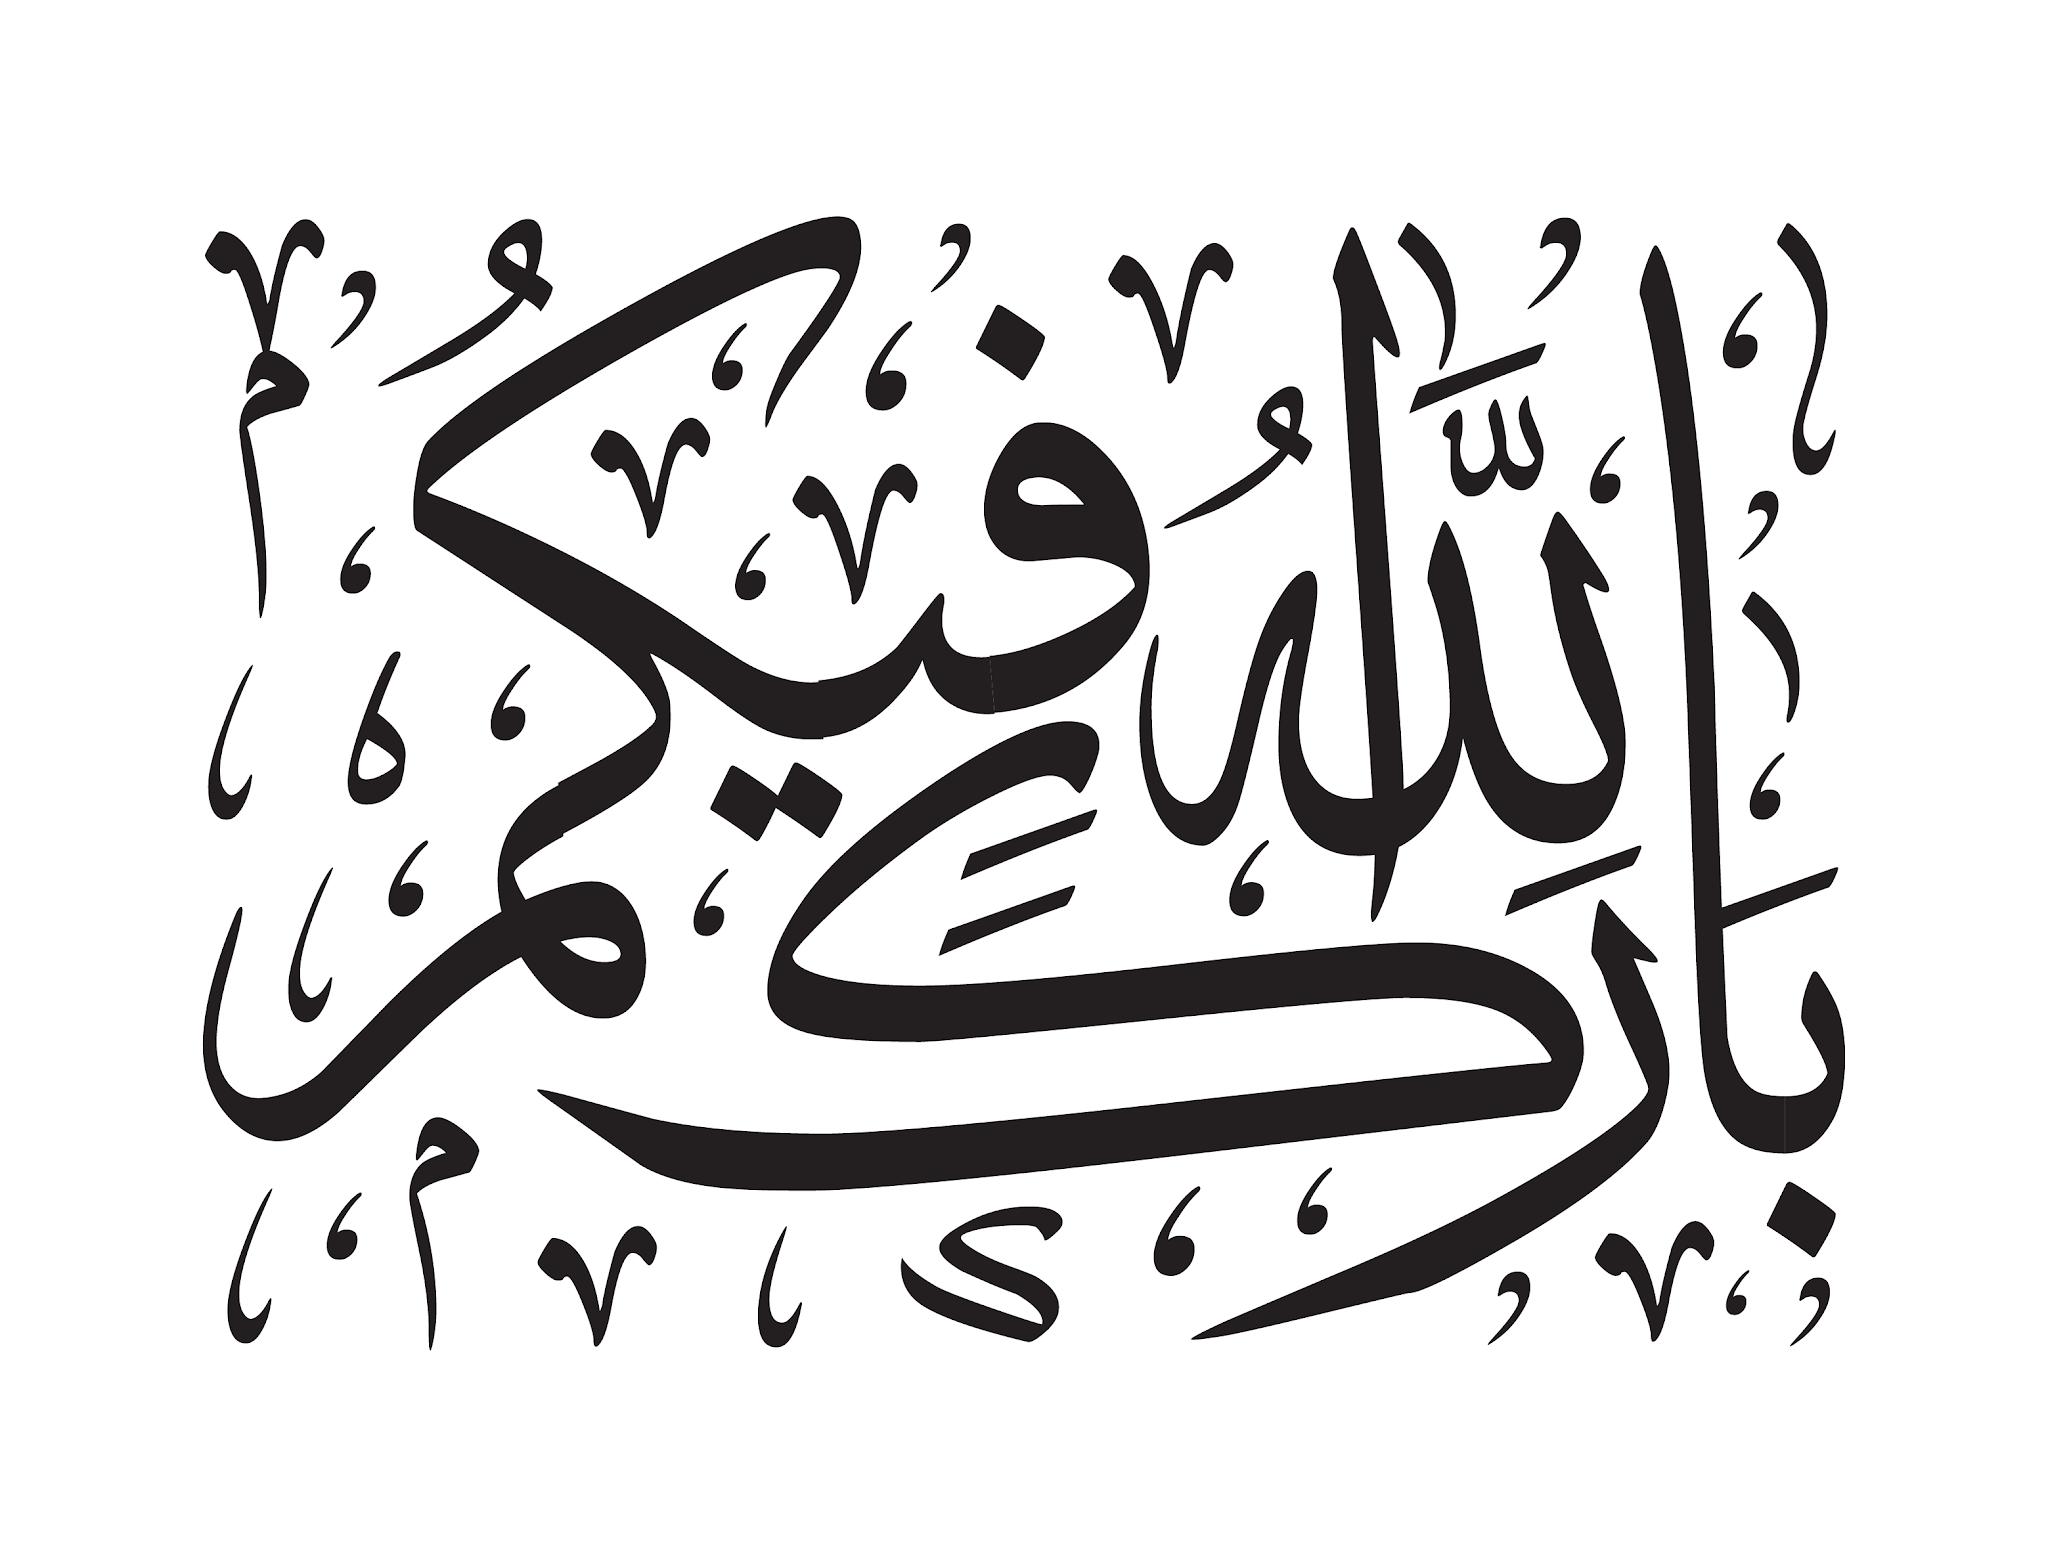 scripts barak allah fikoum islamic svg eps psd ai pdf png vector download free #islamic #islam #arab #arabic #vector #vectors  #scripts #fonts #font